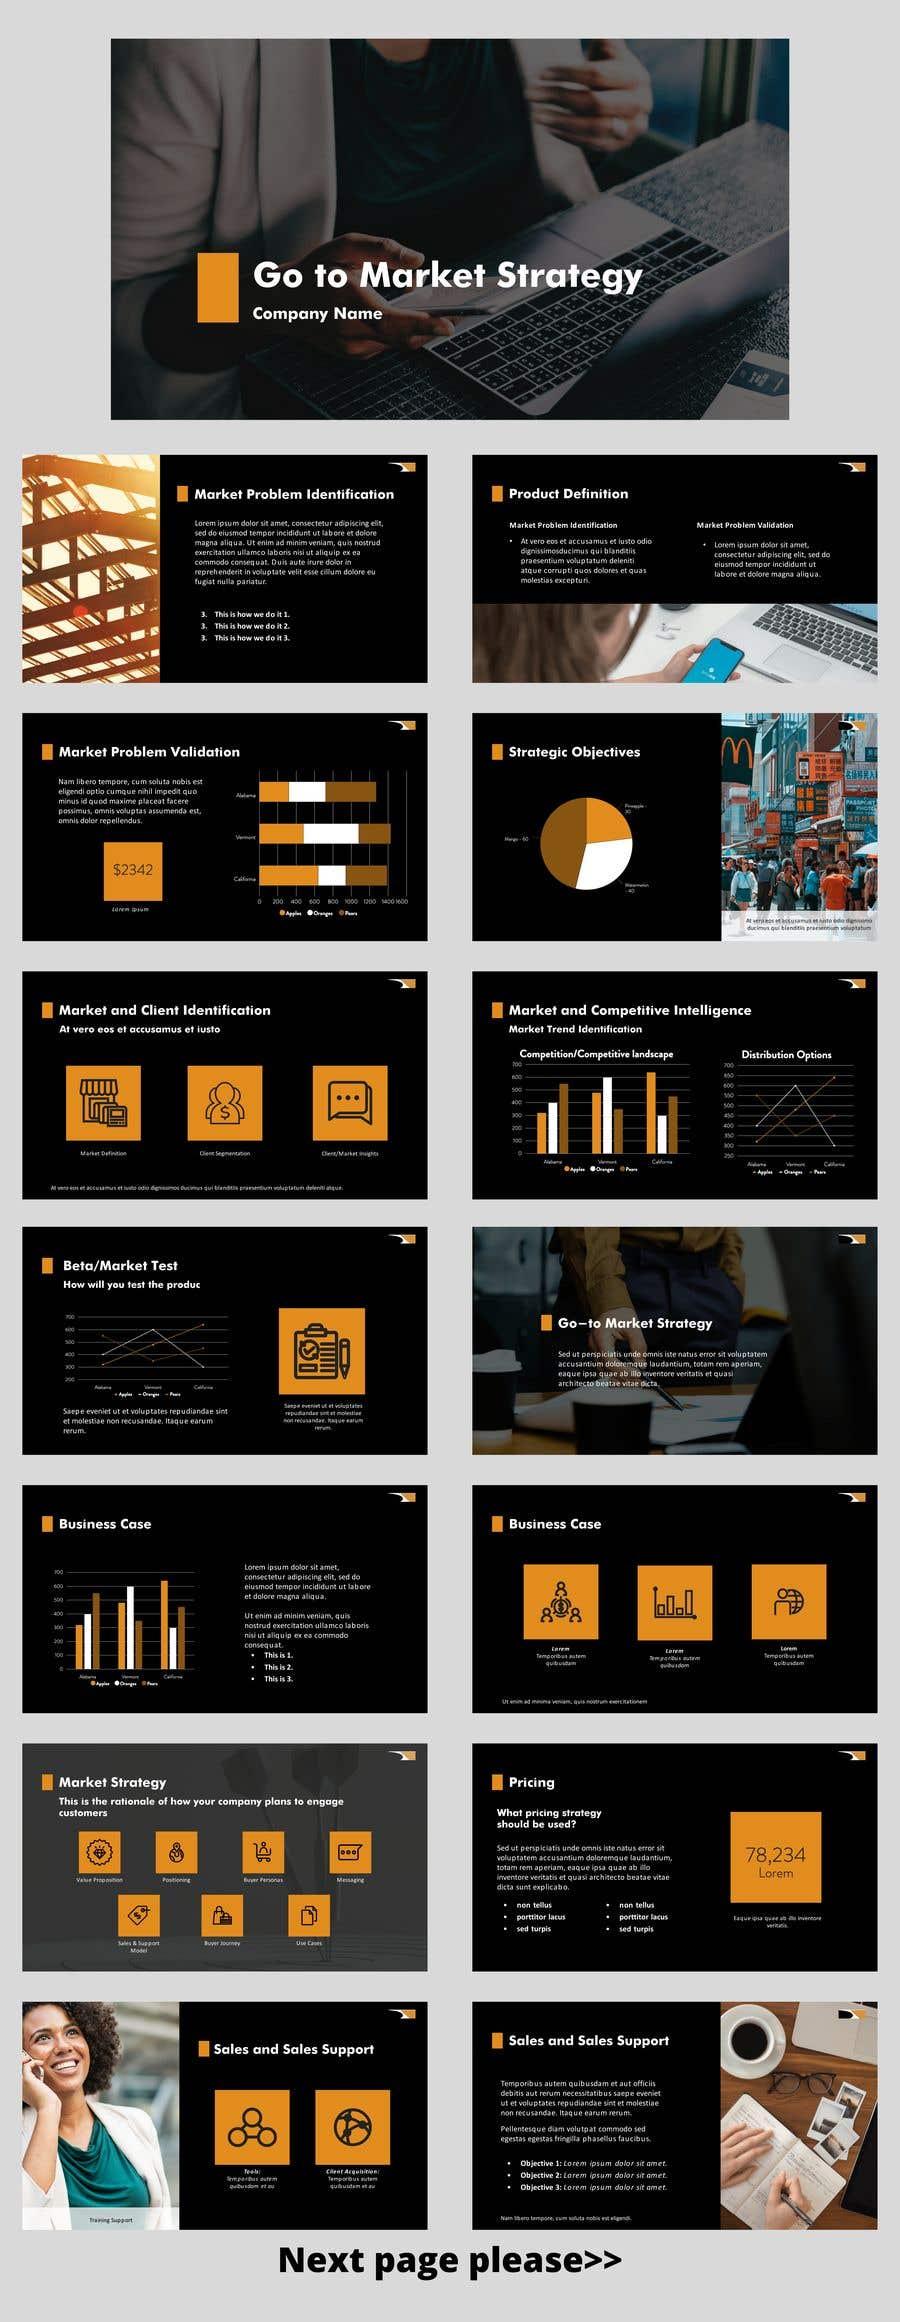 Penyertaan Peraduan #                                        19                                      untuk                                         Design a Custom PowerPoint Template